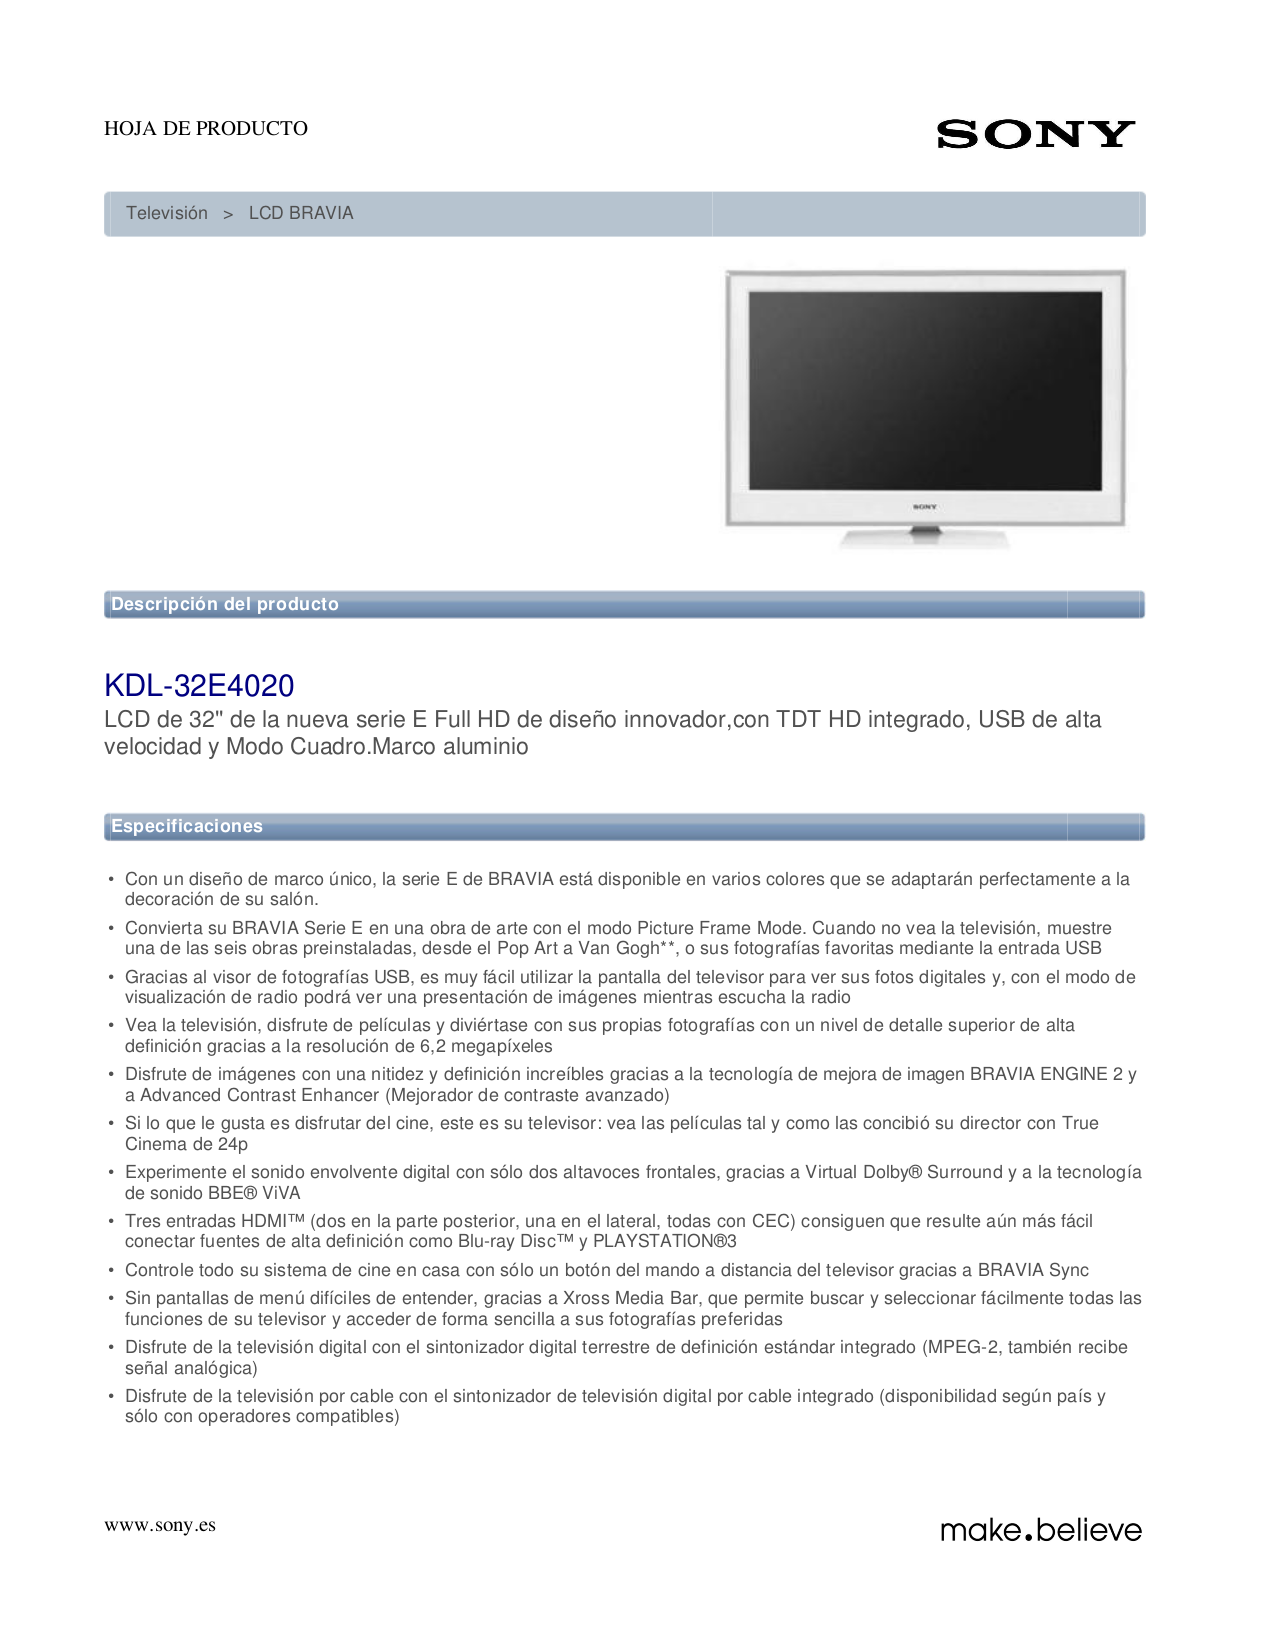 Download free pdf for Sony BRAVIA KDL-32E4020 TV manual